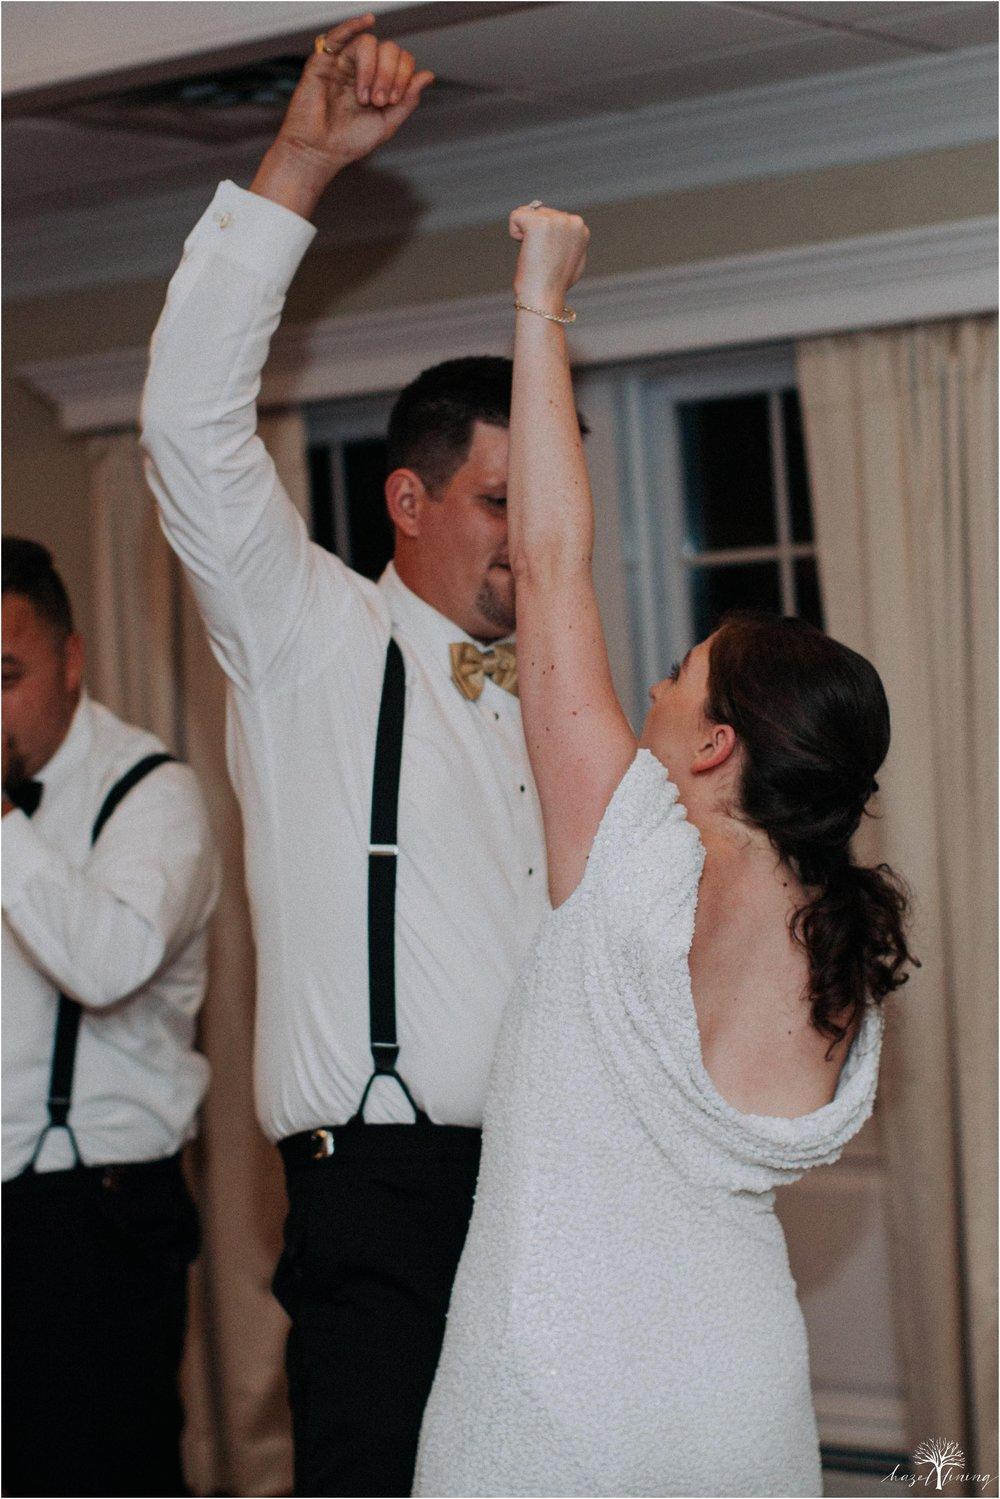 elizabeth-doelp-andrew-foreback-middletown-country-club-summer-langhorne-pennsylvania-wedding-hazel-lining-travel-wedding-elopement-photography_0163.jpg